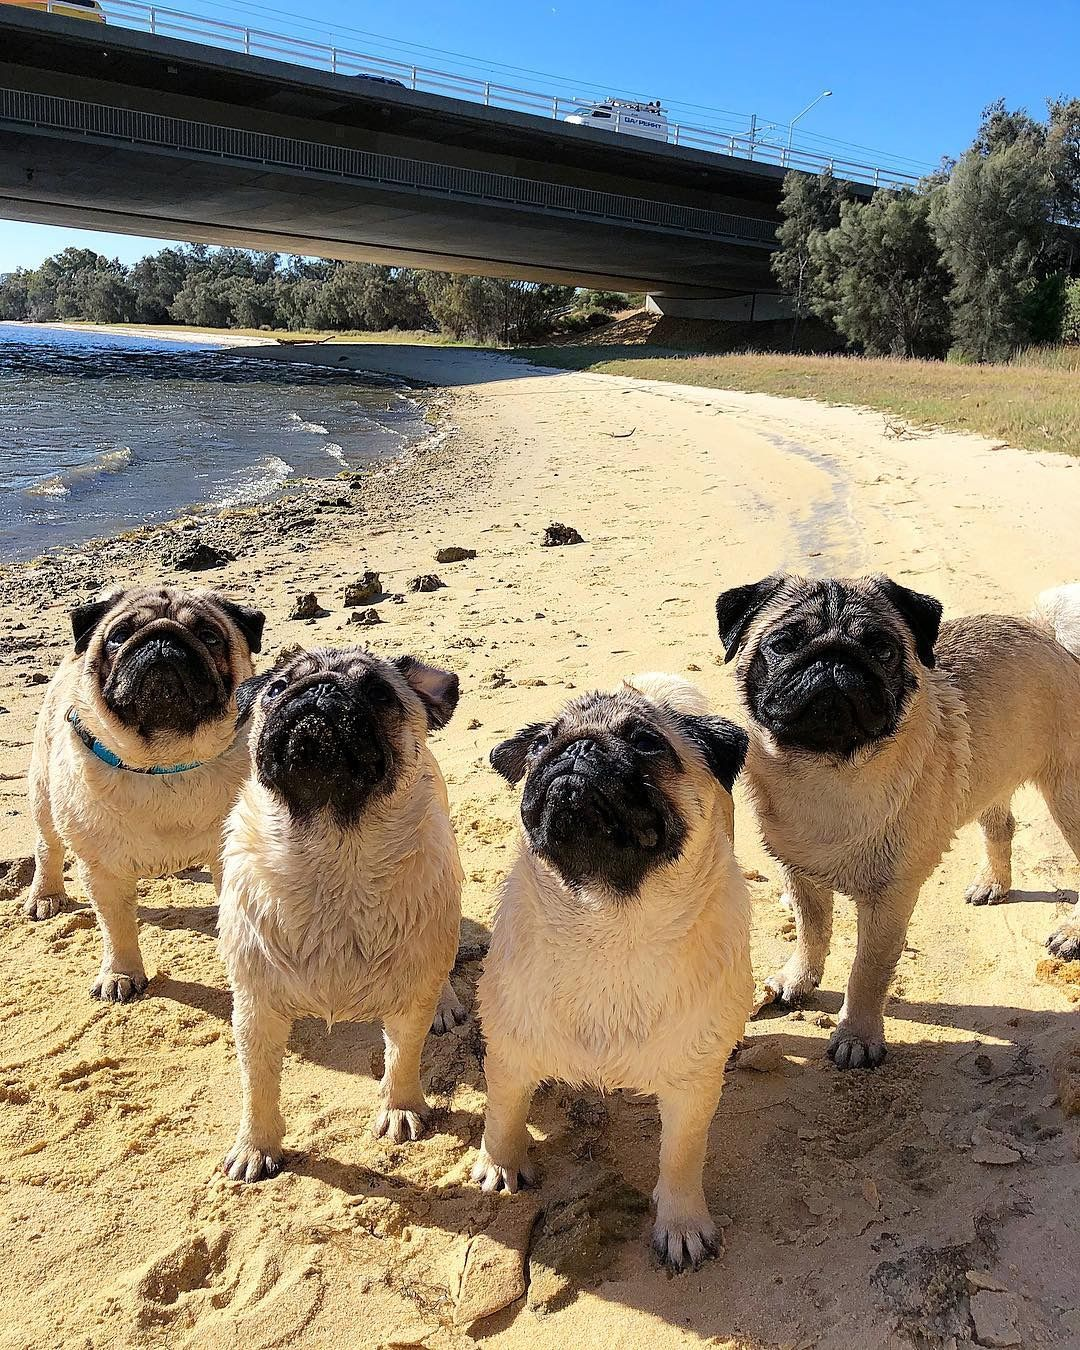 Pin By Vlynn On Furbabies Cute Pug Puppies